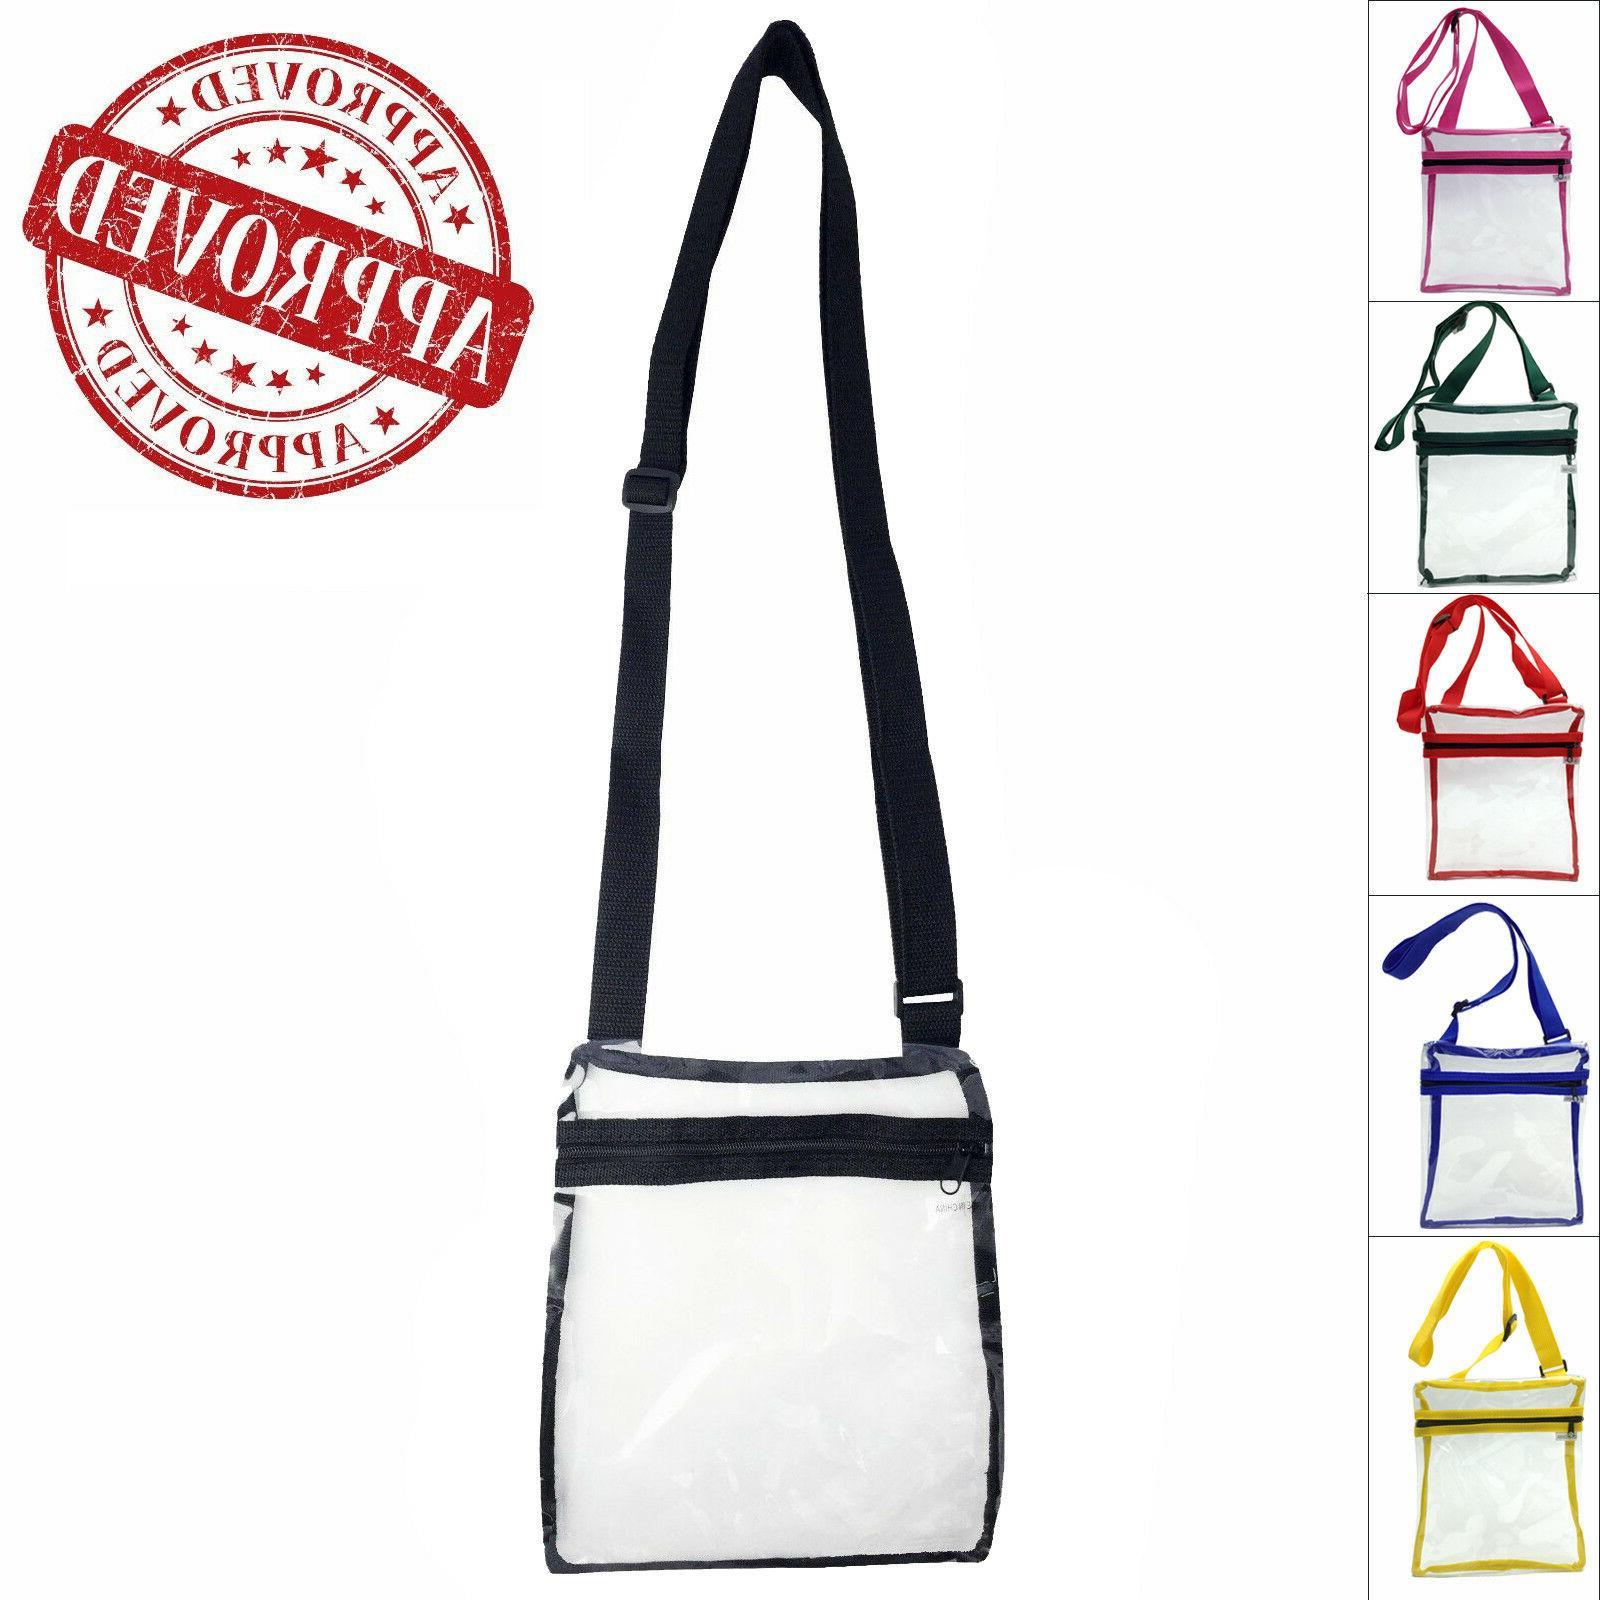 transparent stylish pvc purse clear handbag tote